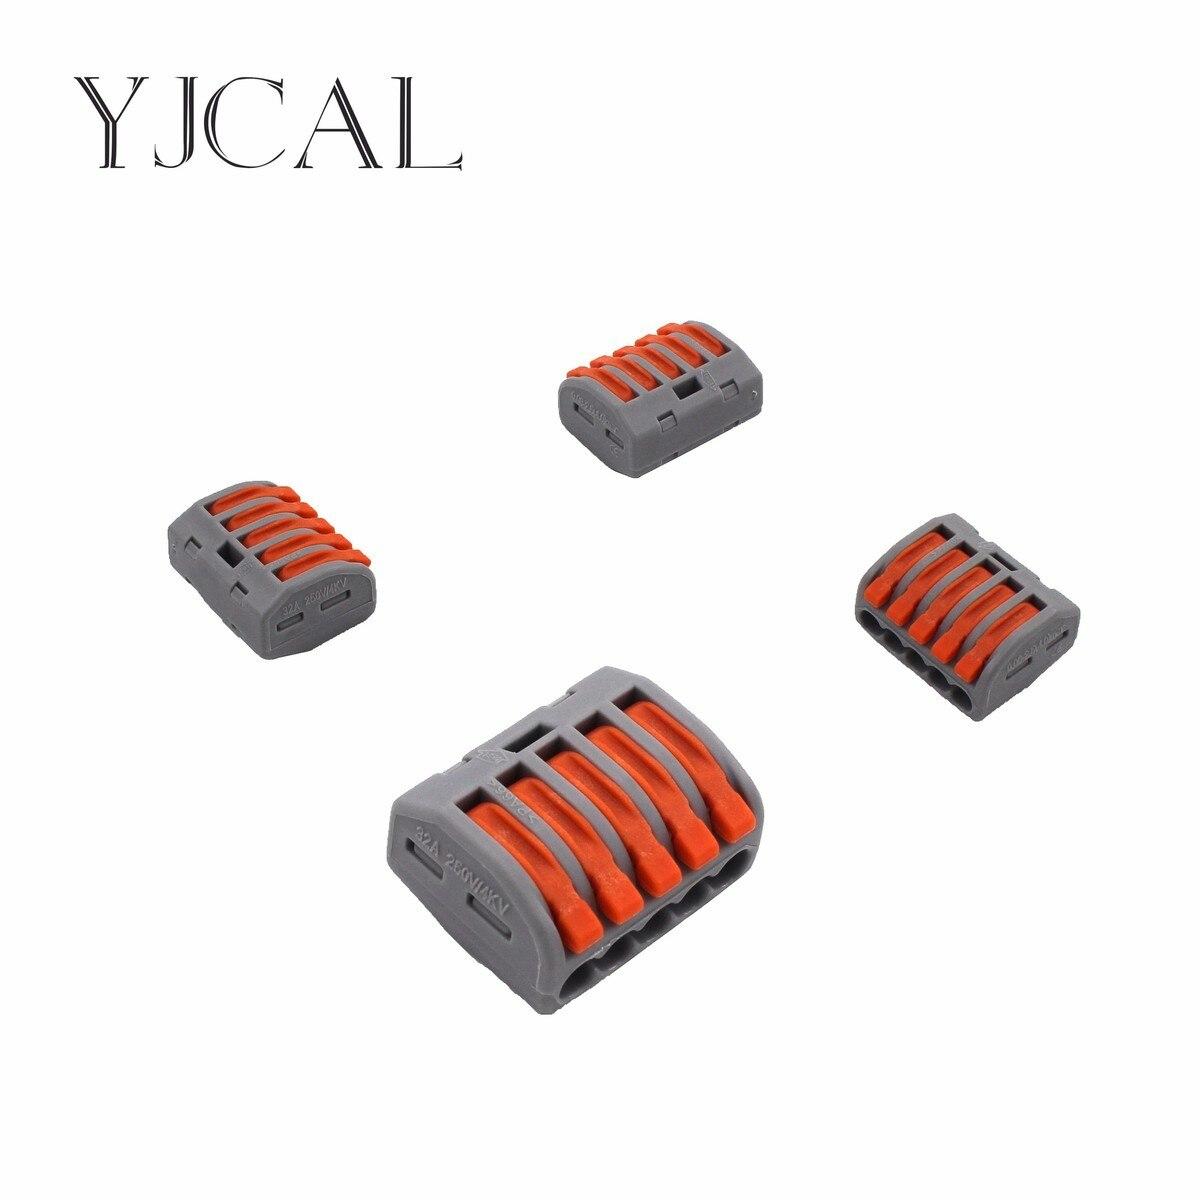 Wago Typ 222-415 20 STÜCKE Universal Compact Verdrahtung Conector ...